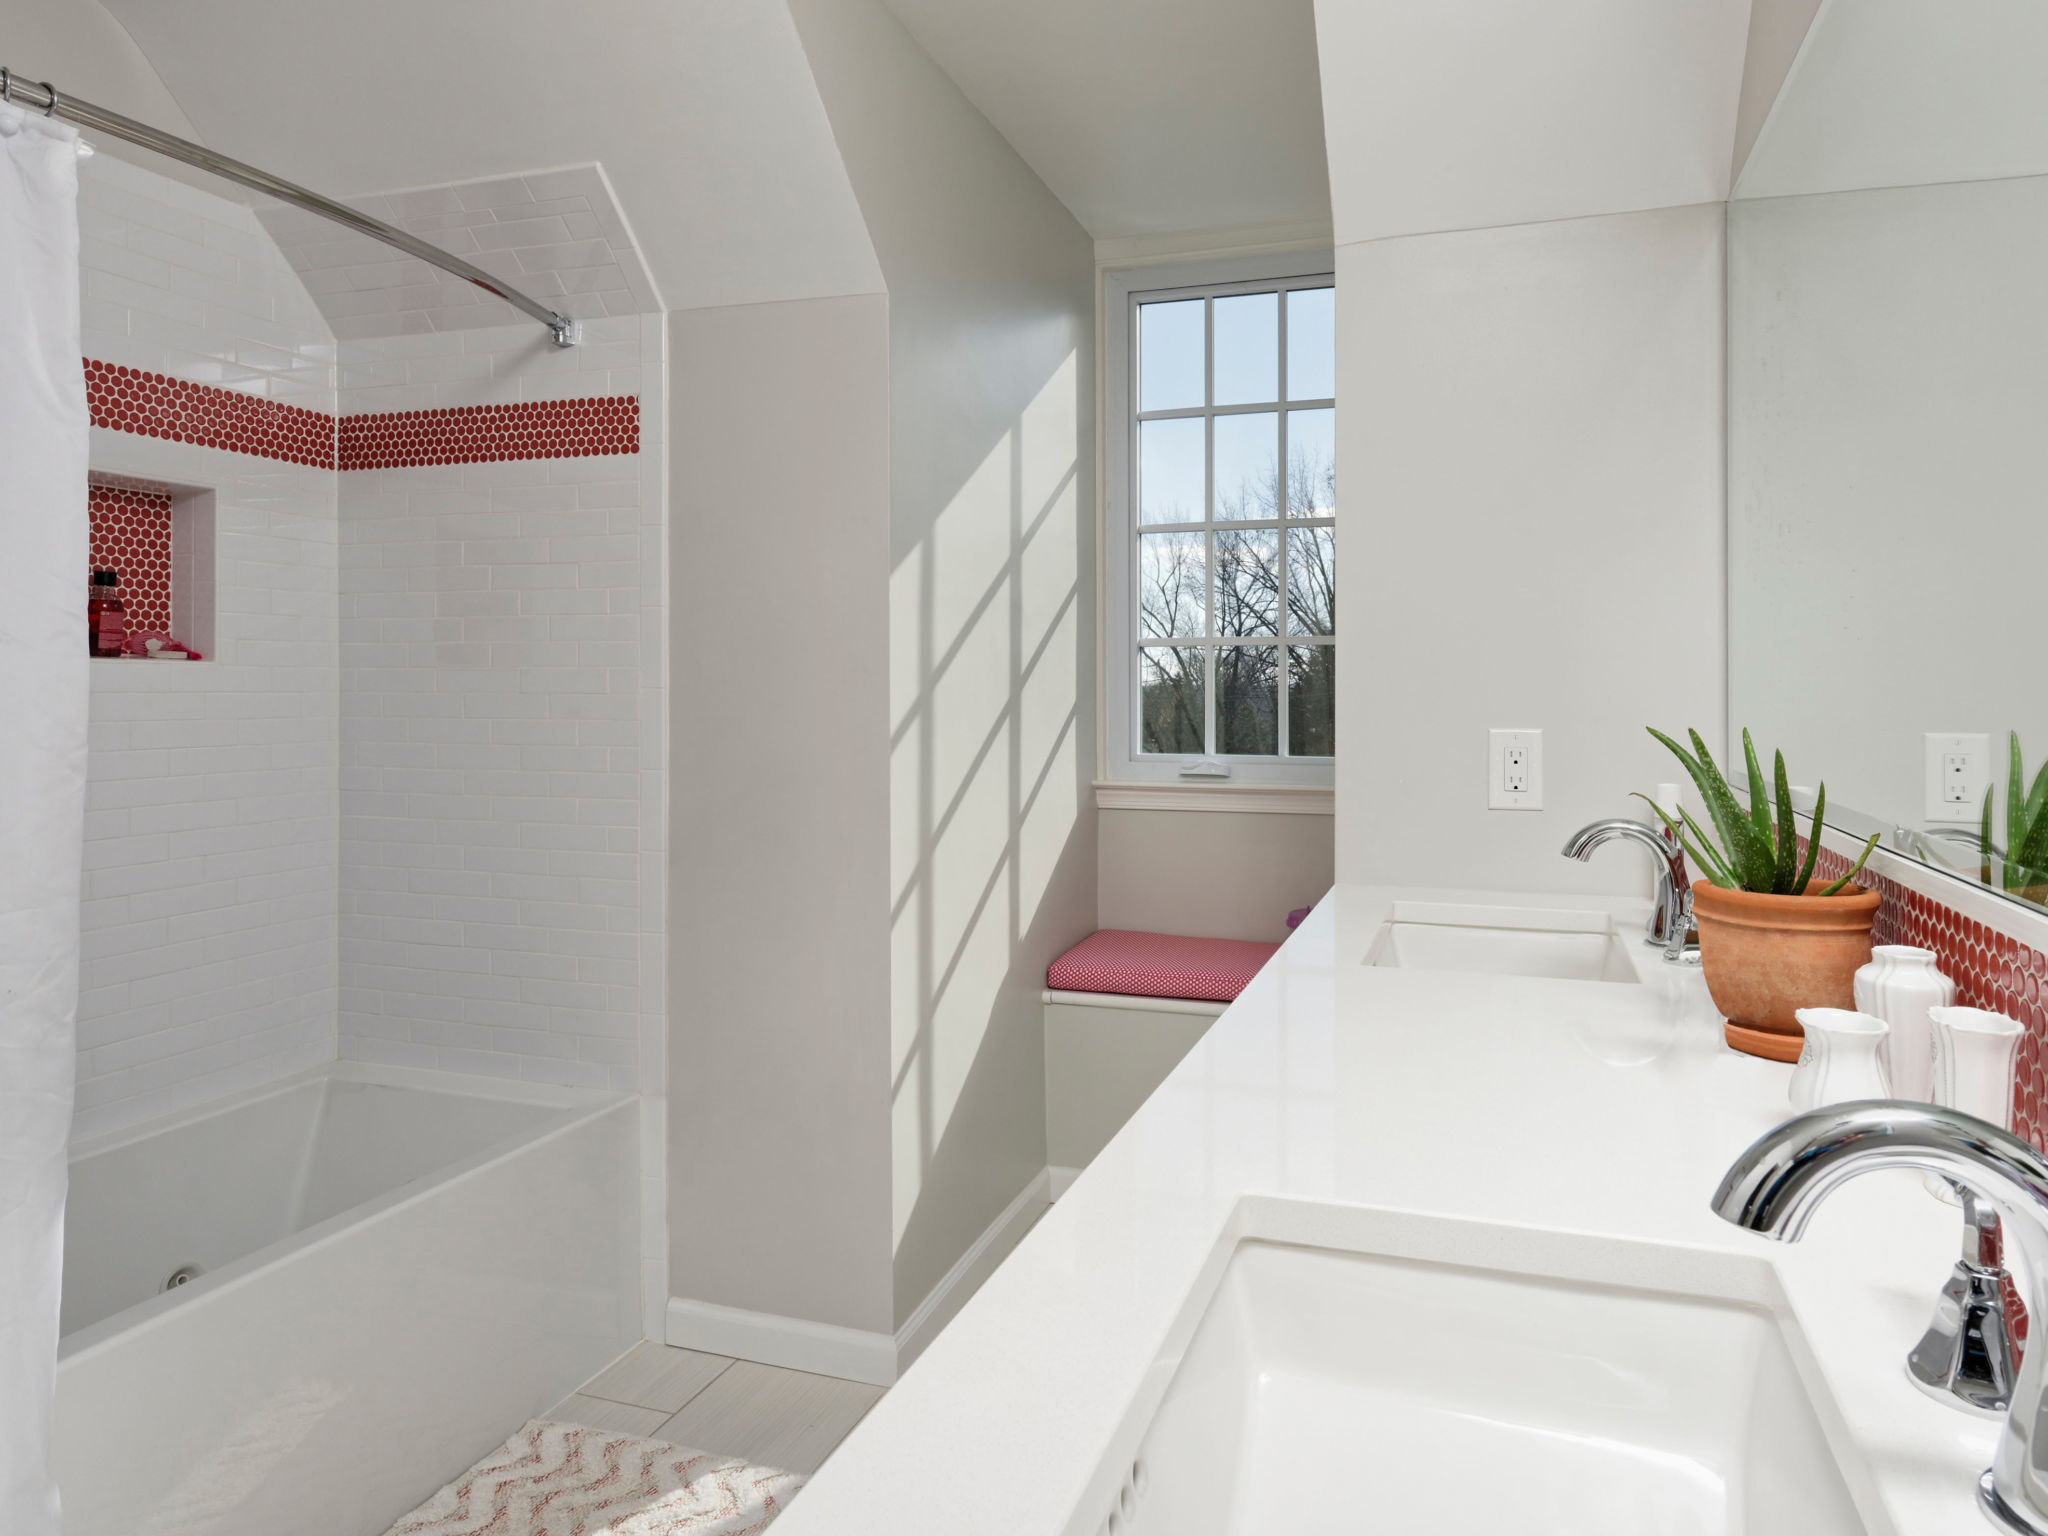 Before after remodeling photos metro building - Bathroom remodeling alexandria va ...